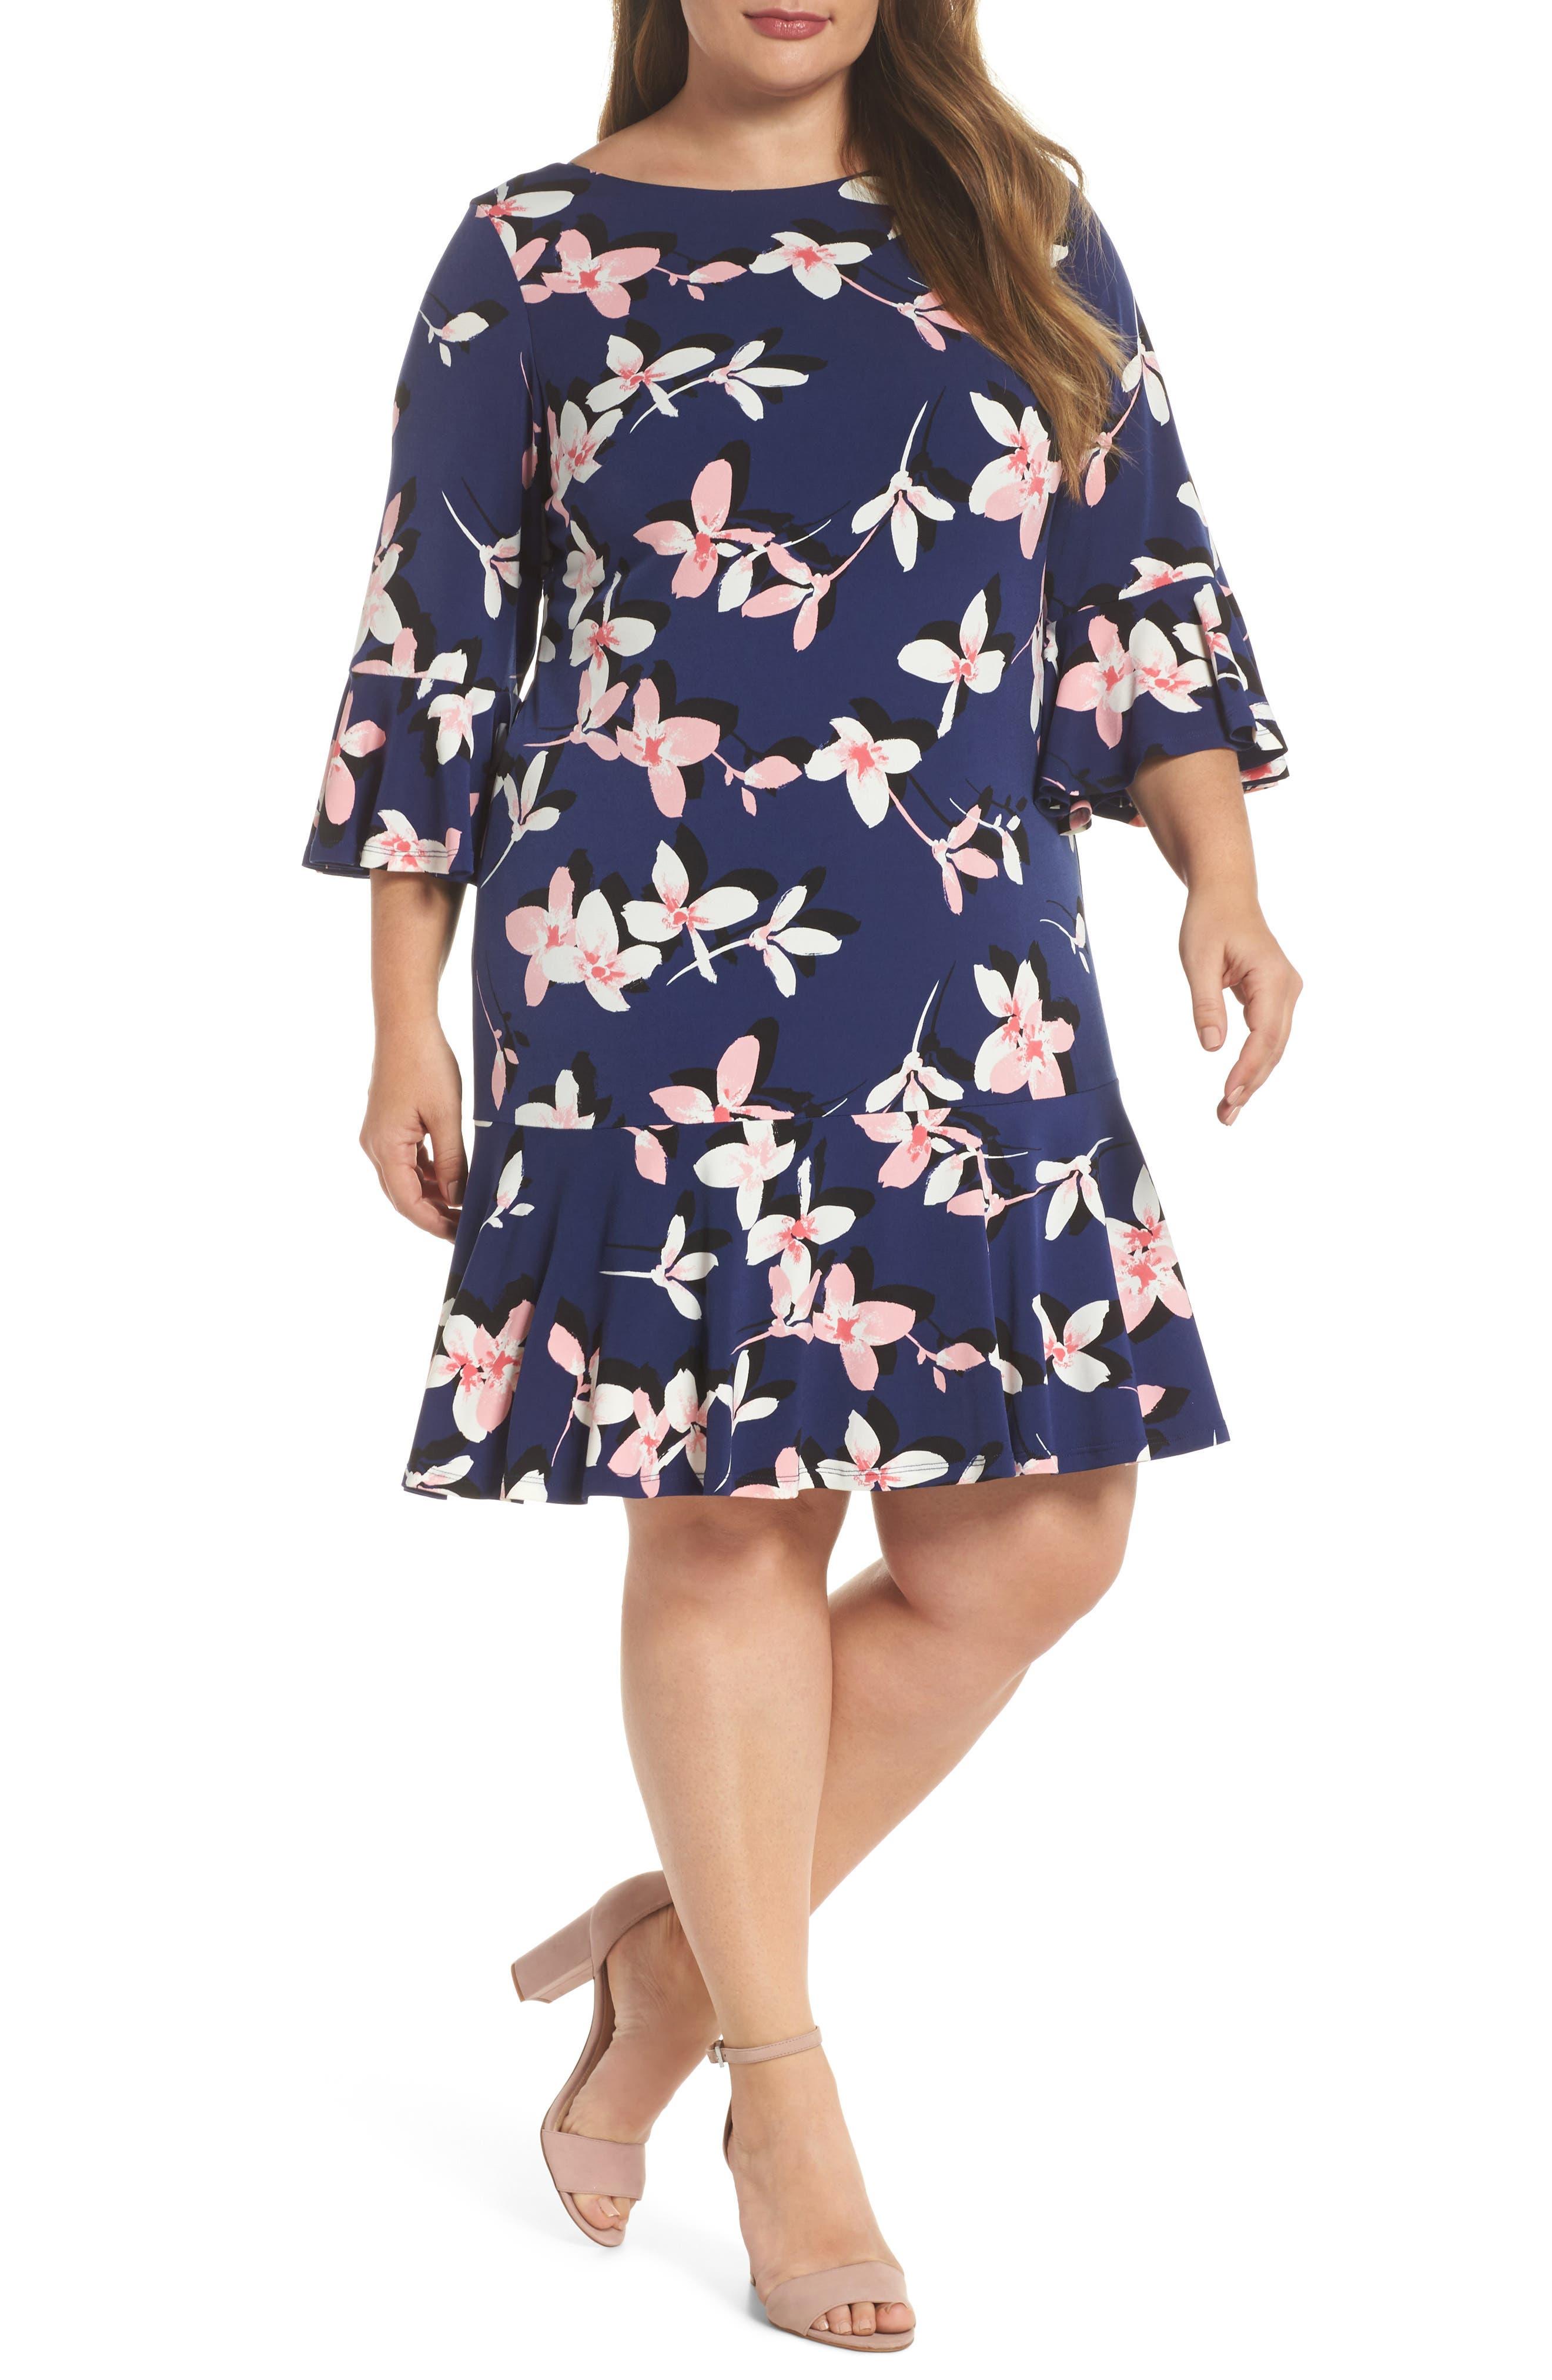 Floral Print Bell Sleeve Dress,                             Main thumbnail 1, color,                             410